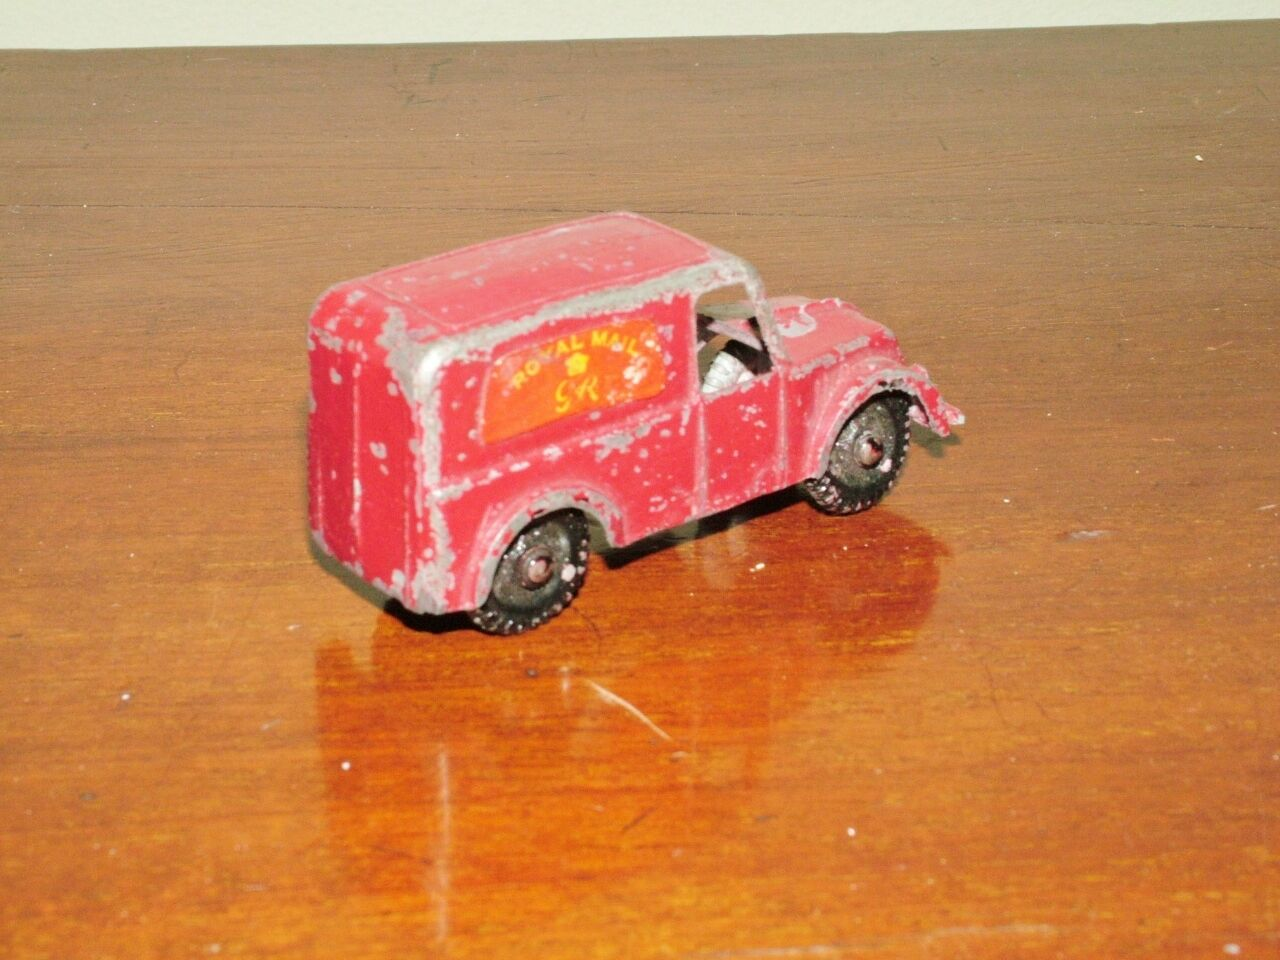 Charbens Royal Mail Delivery Van-Raro Van-Raro Van-Raro 4113b5